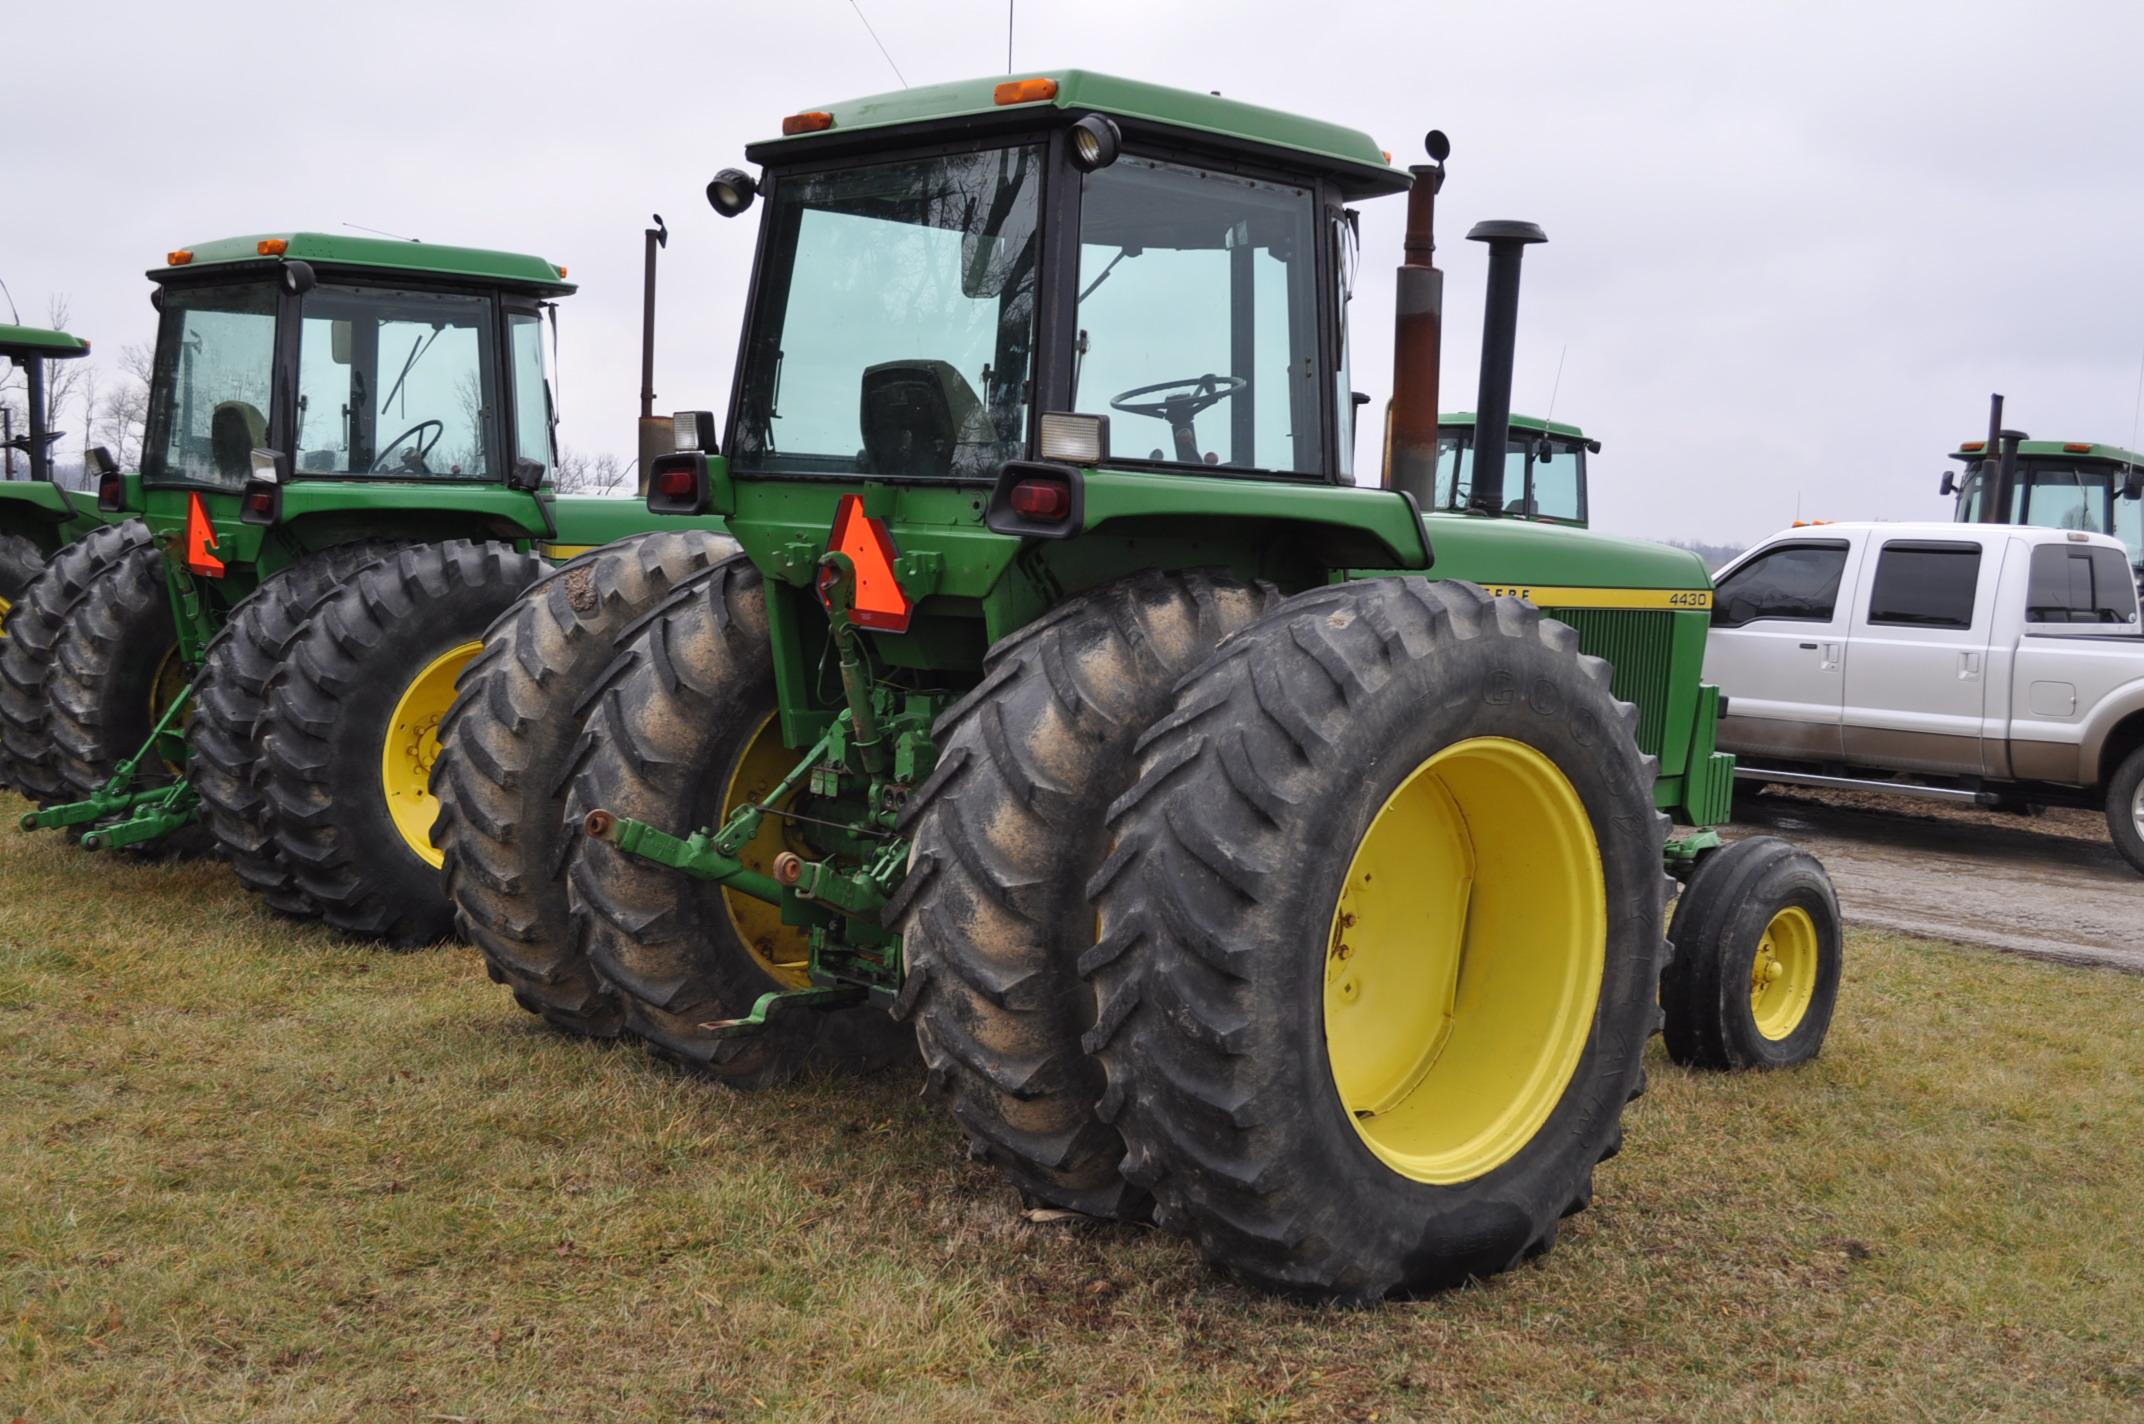 John Deere 4430 tractor, diesel, 18.4-34 hub duals, 10.00-16 front, CHA, Quad range, 2 hyd - Image 3 of 20